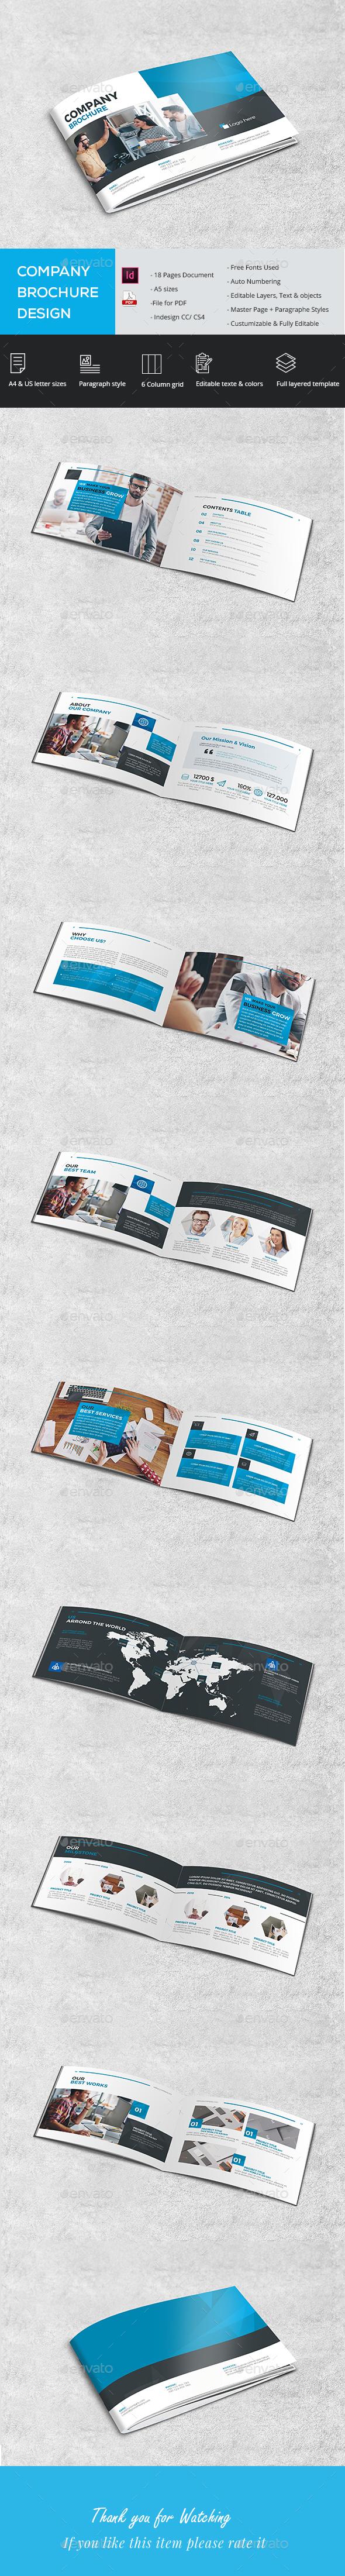 A5 Company Brochure - Corporate Brochures